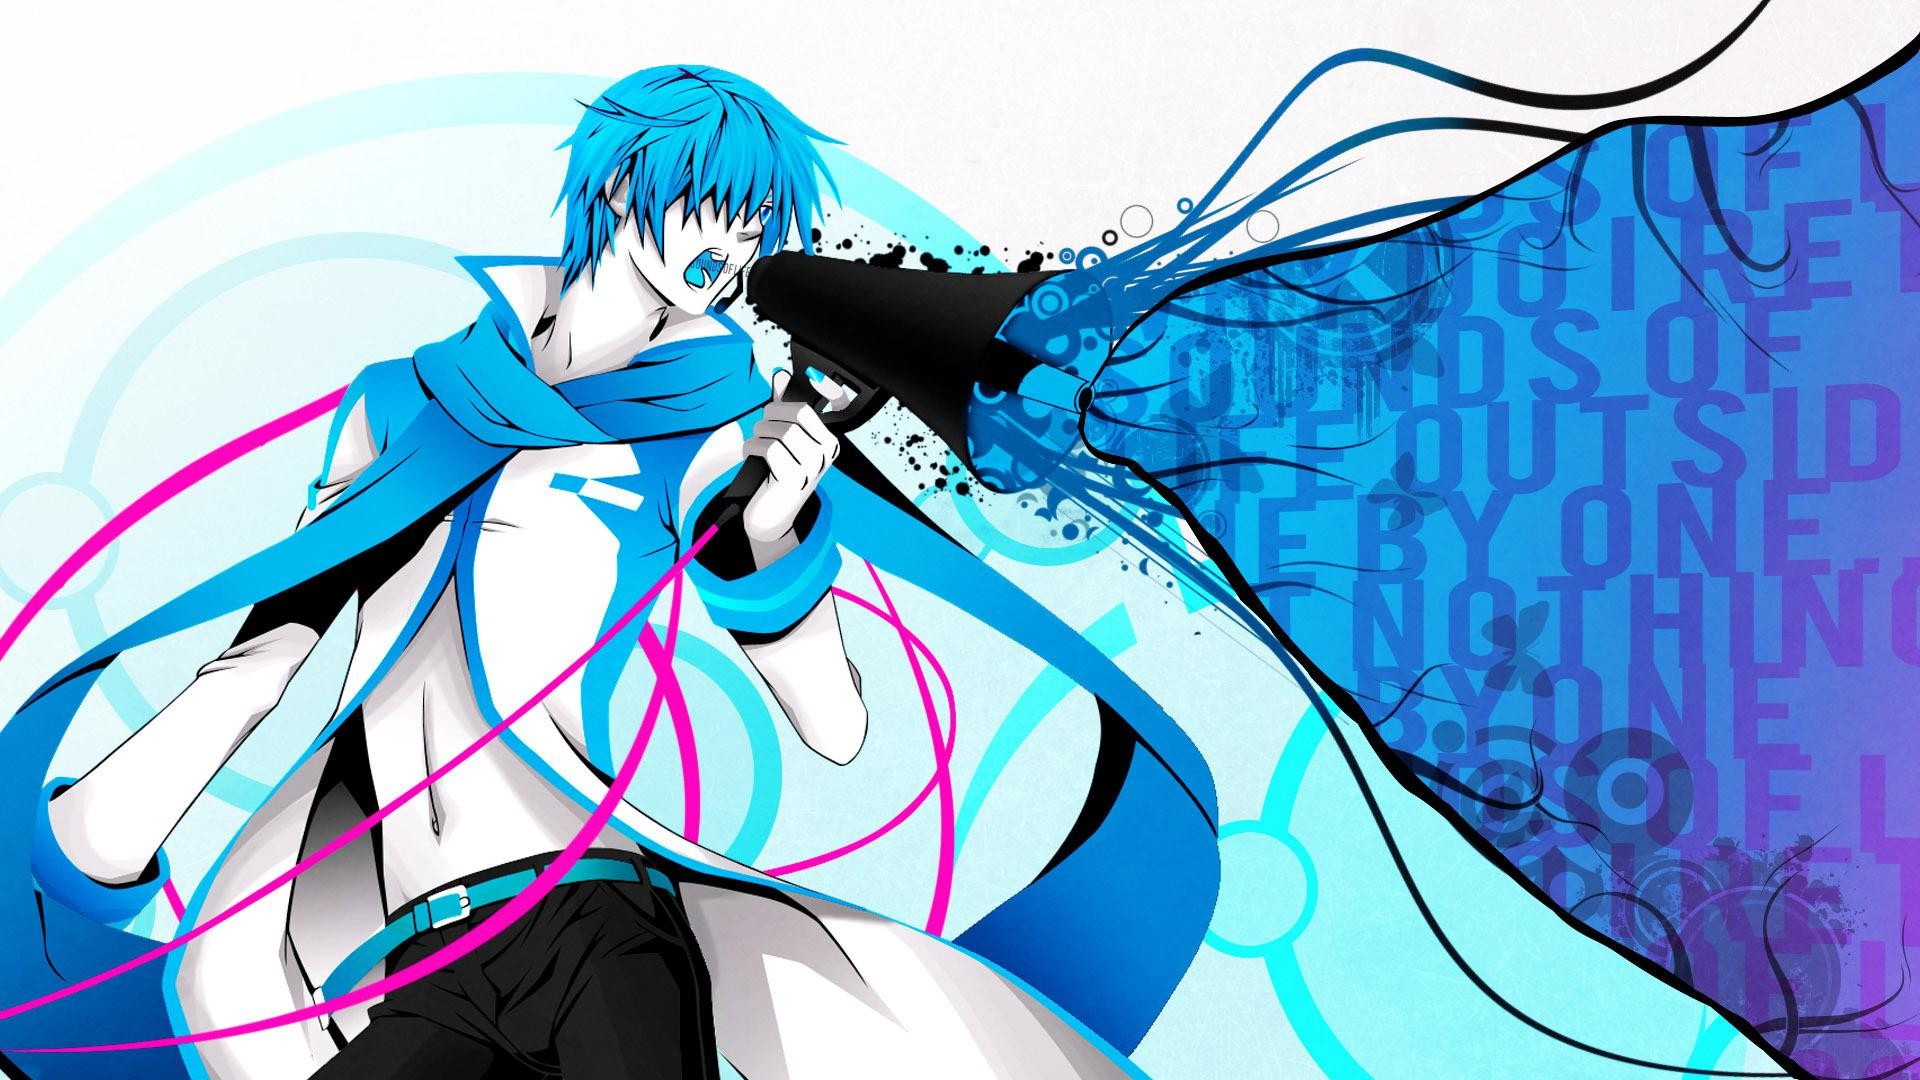 Vocaloid Kaito Wallpaper (70+ images)Vocaloid Kaito